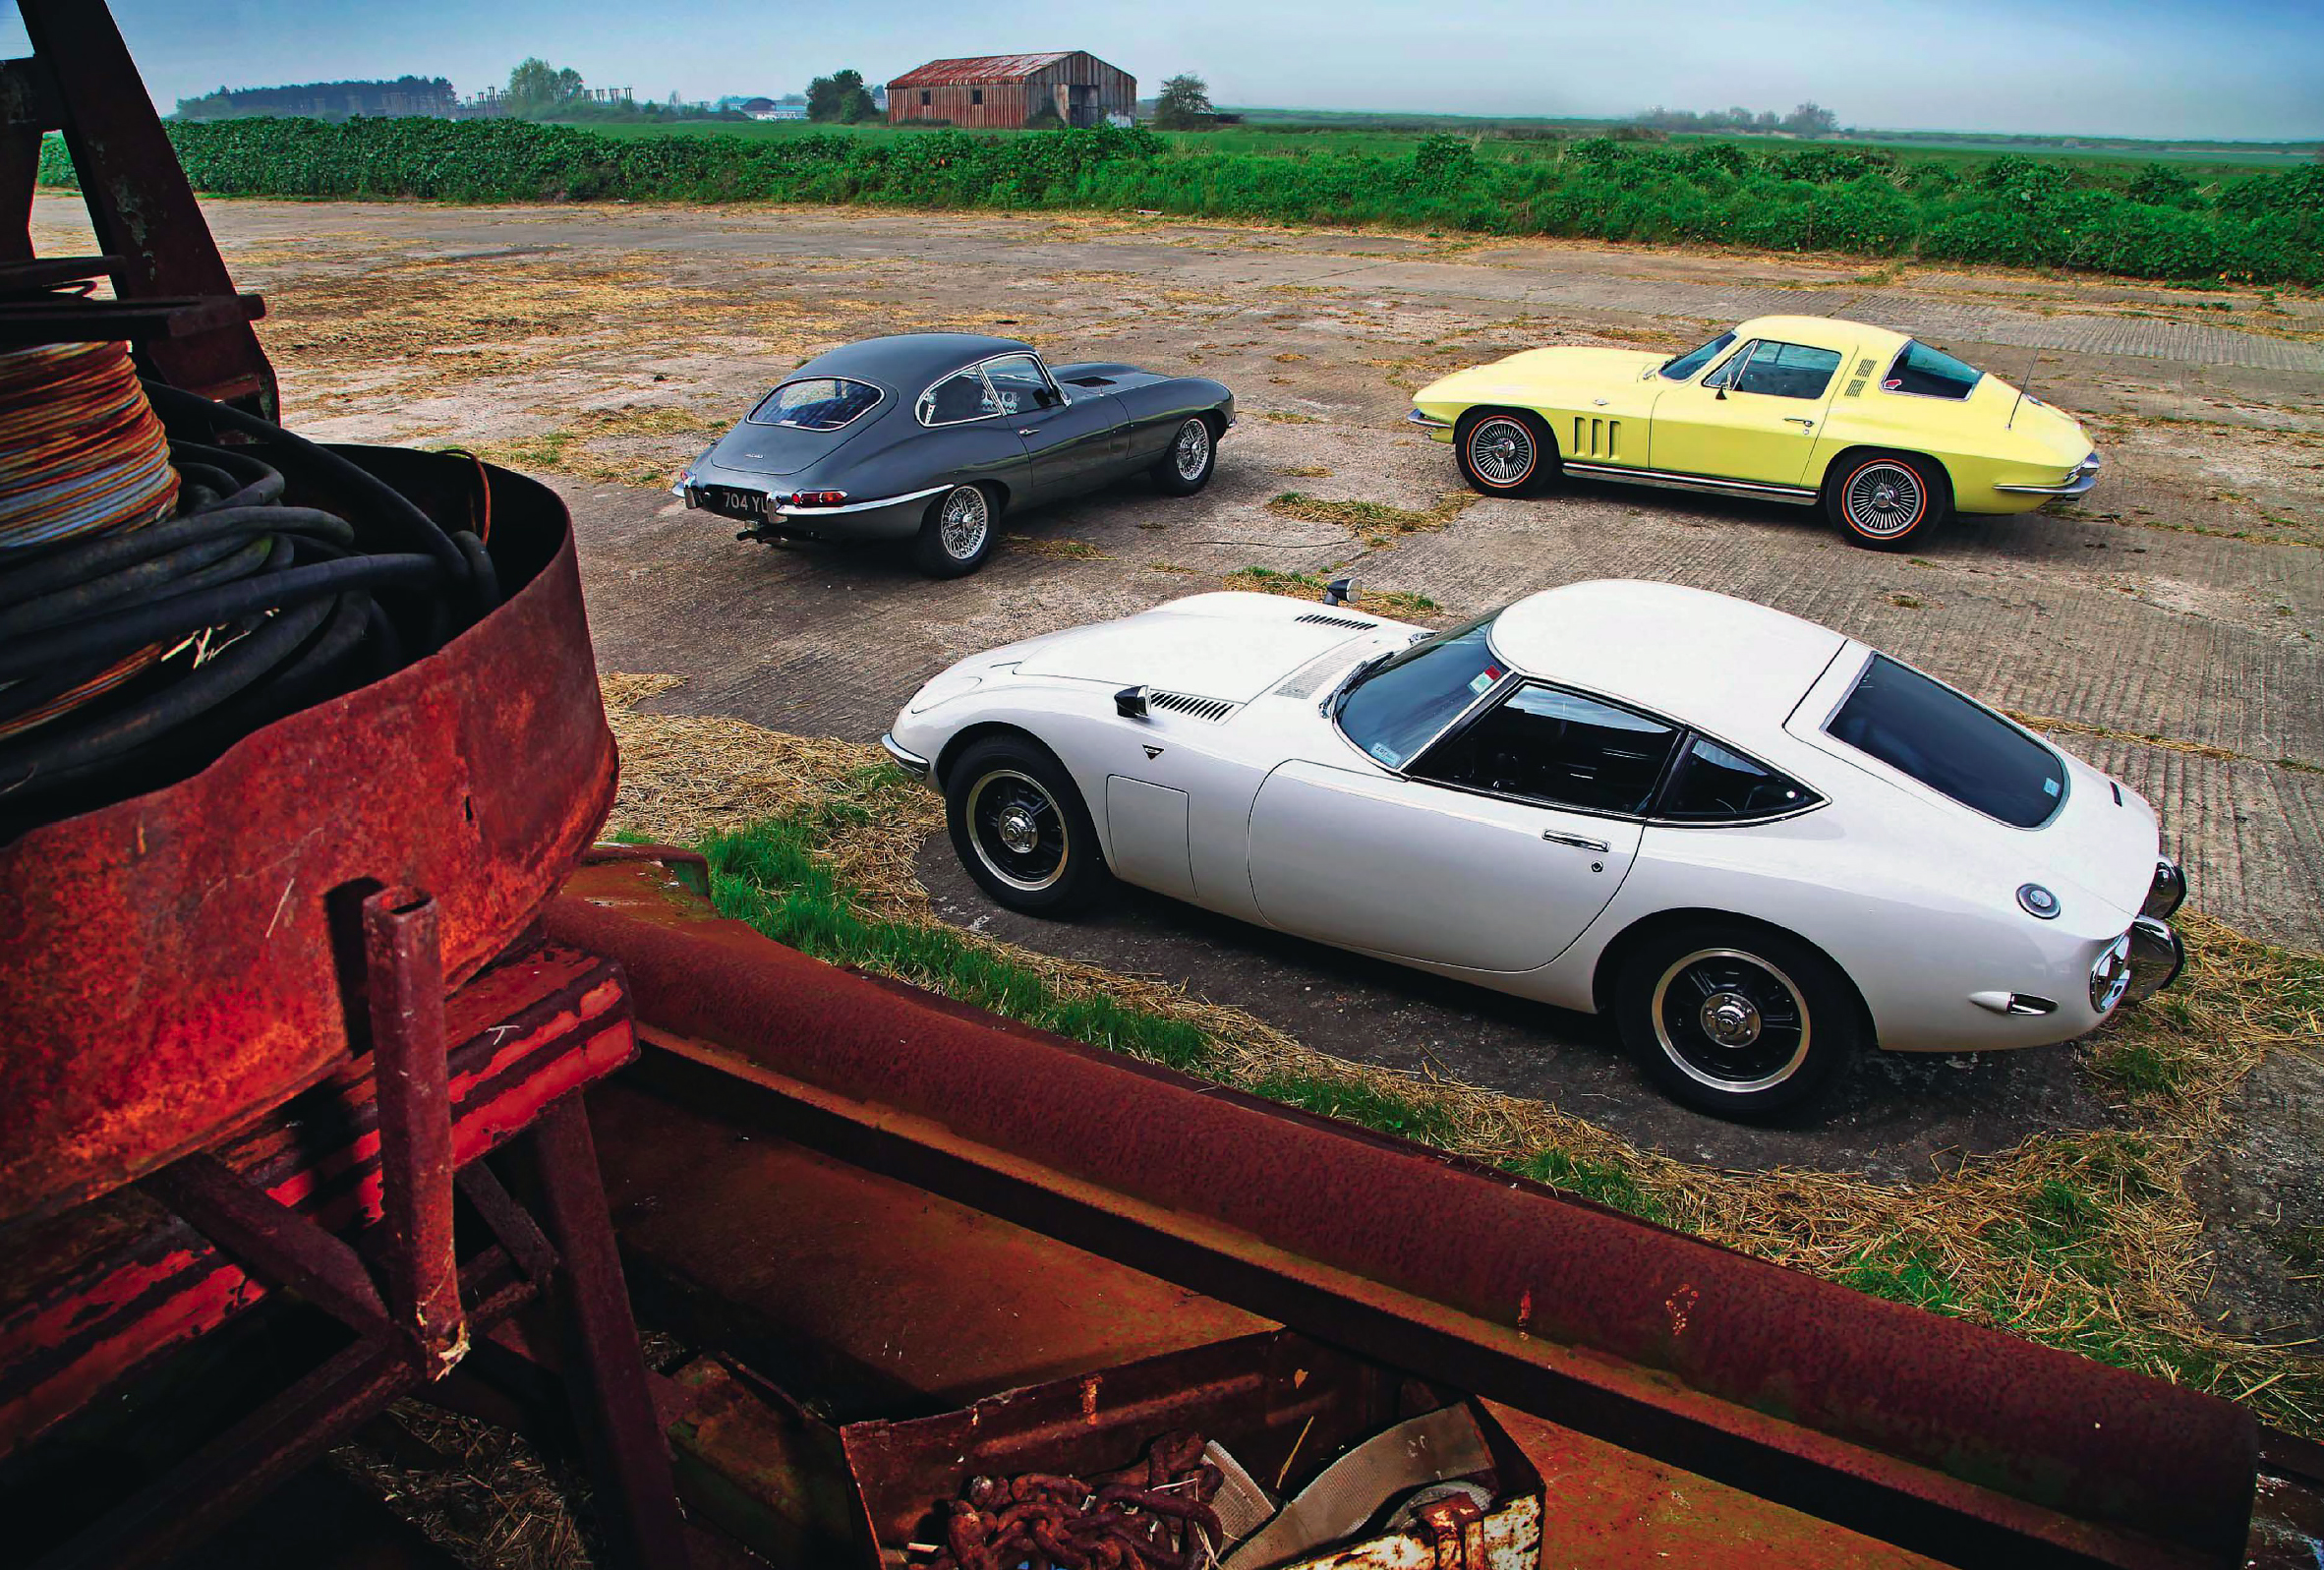 Chevrolet Corvette Stingray C2 Vs Jaguar E Type S1 Fhc And Toyota 2000gt